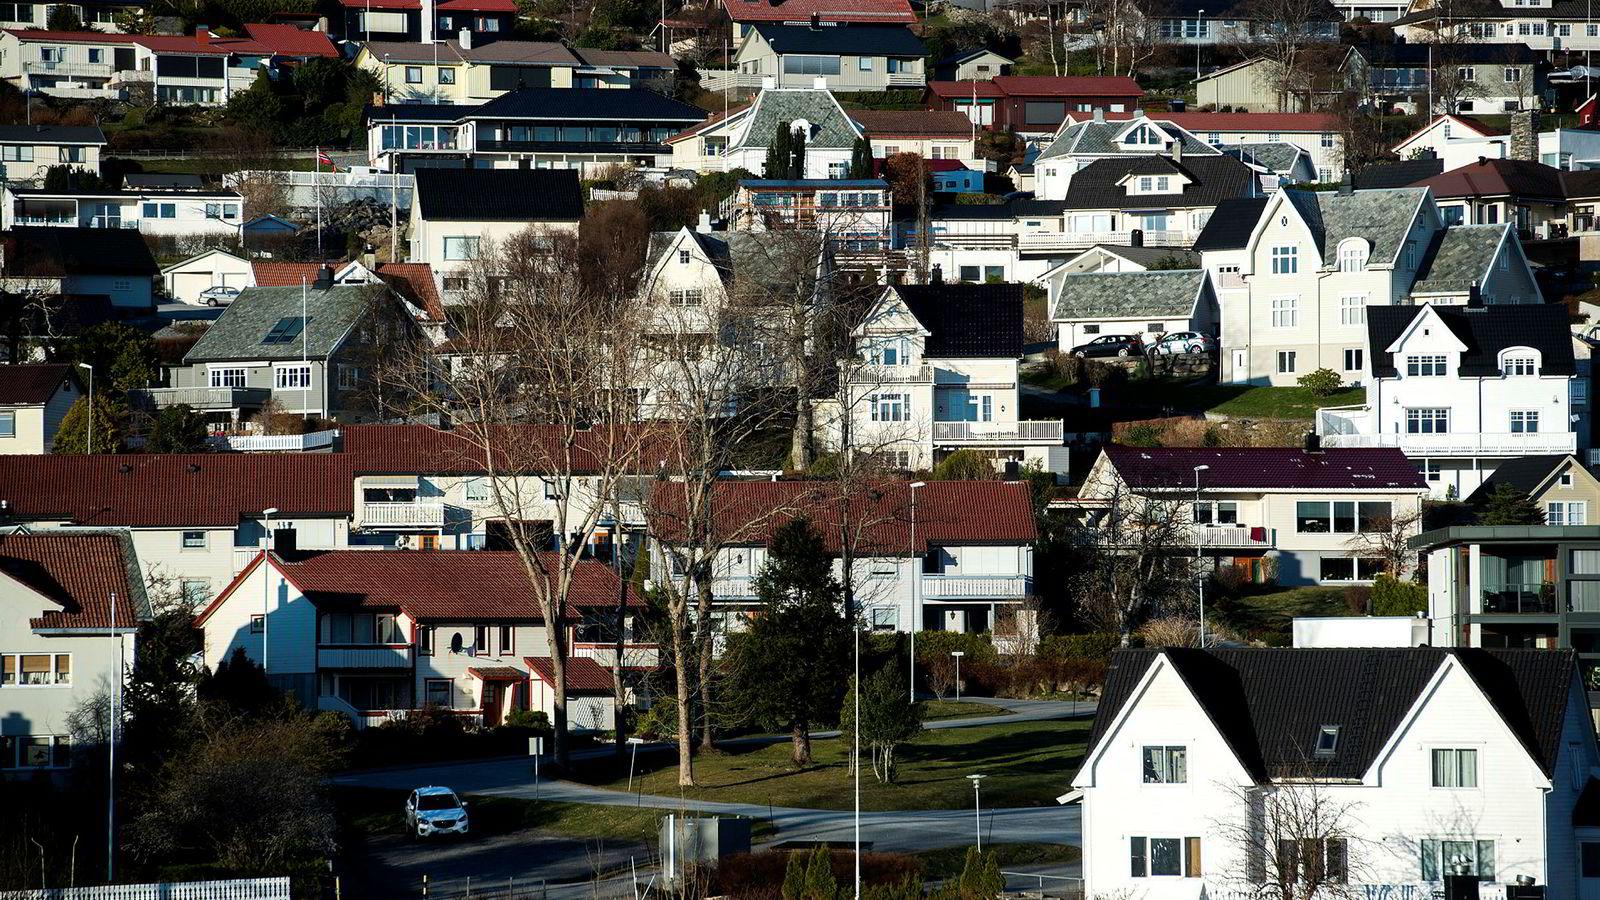 Eneboliger i Ulsteinvik.